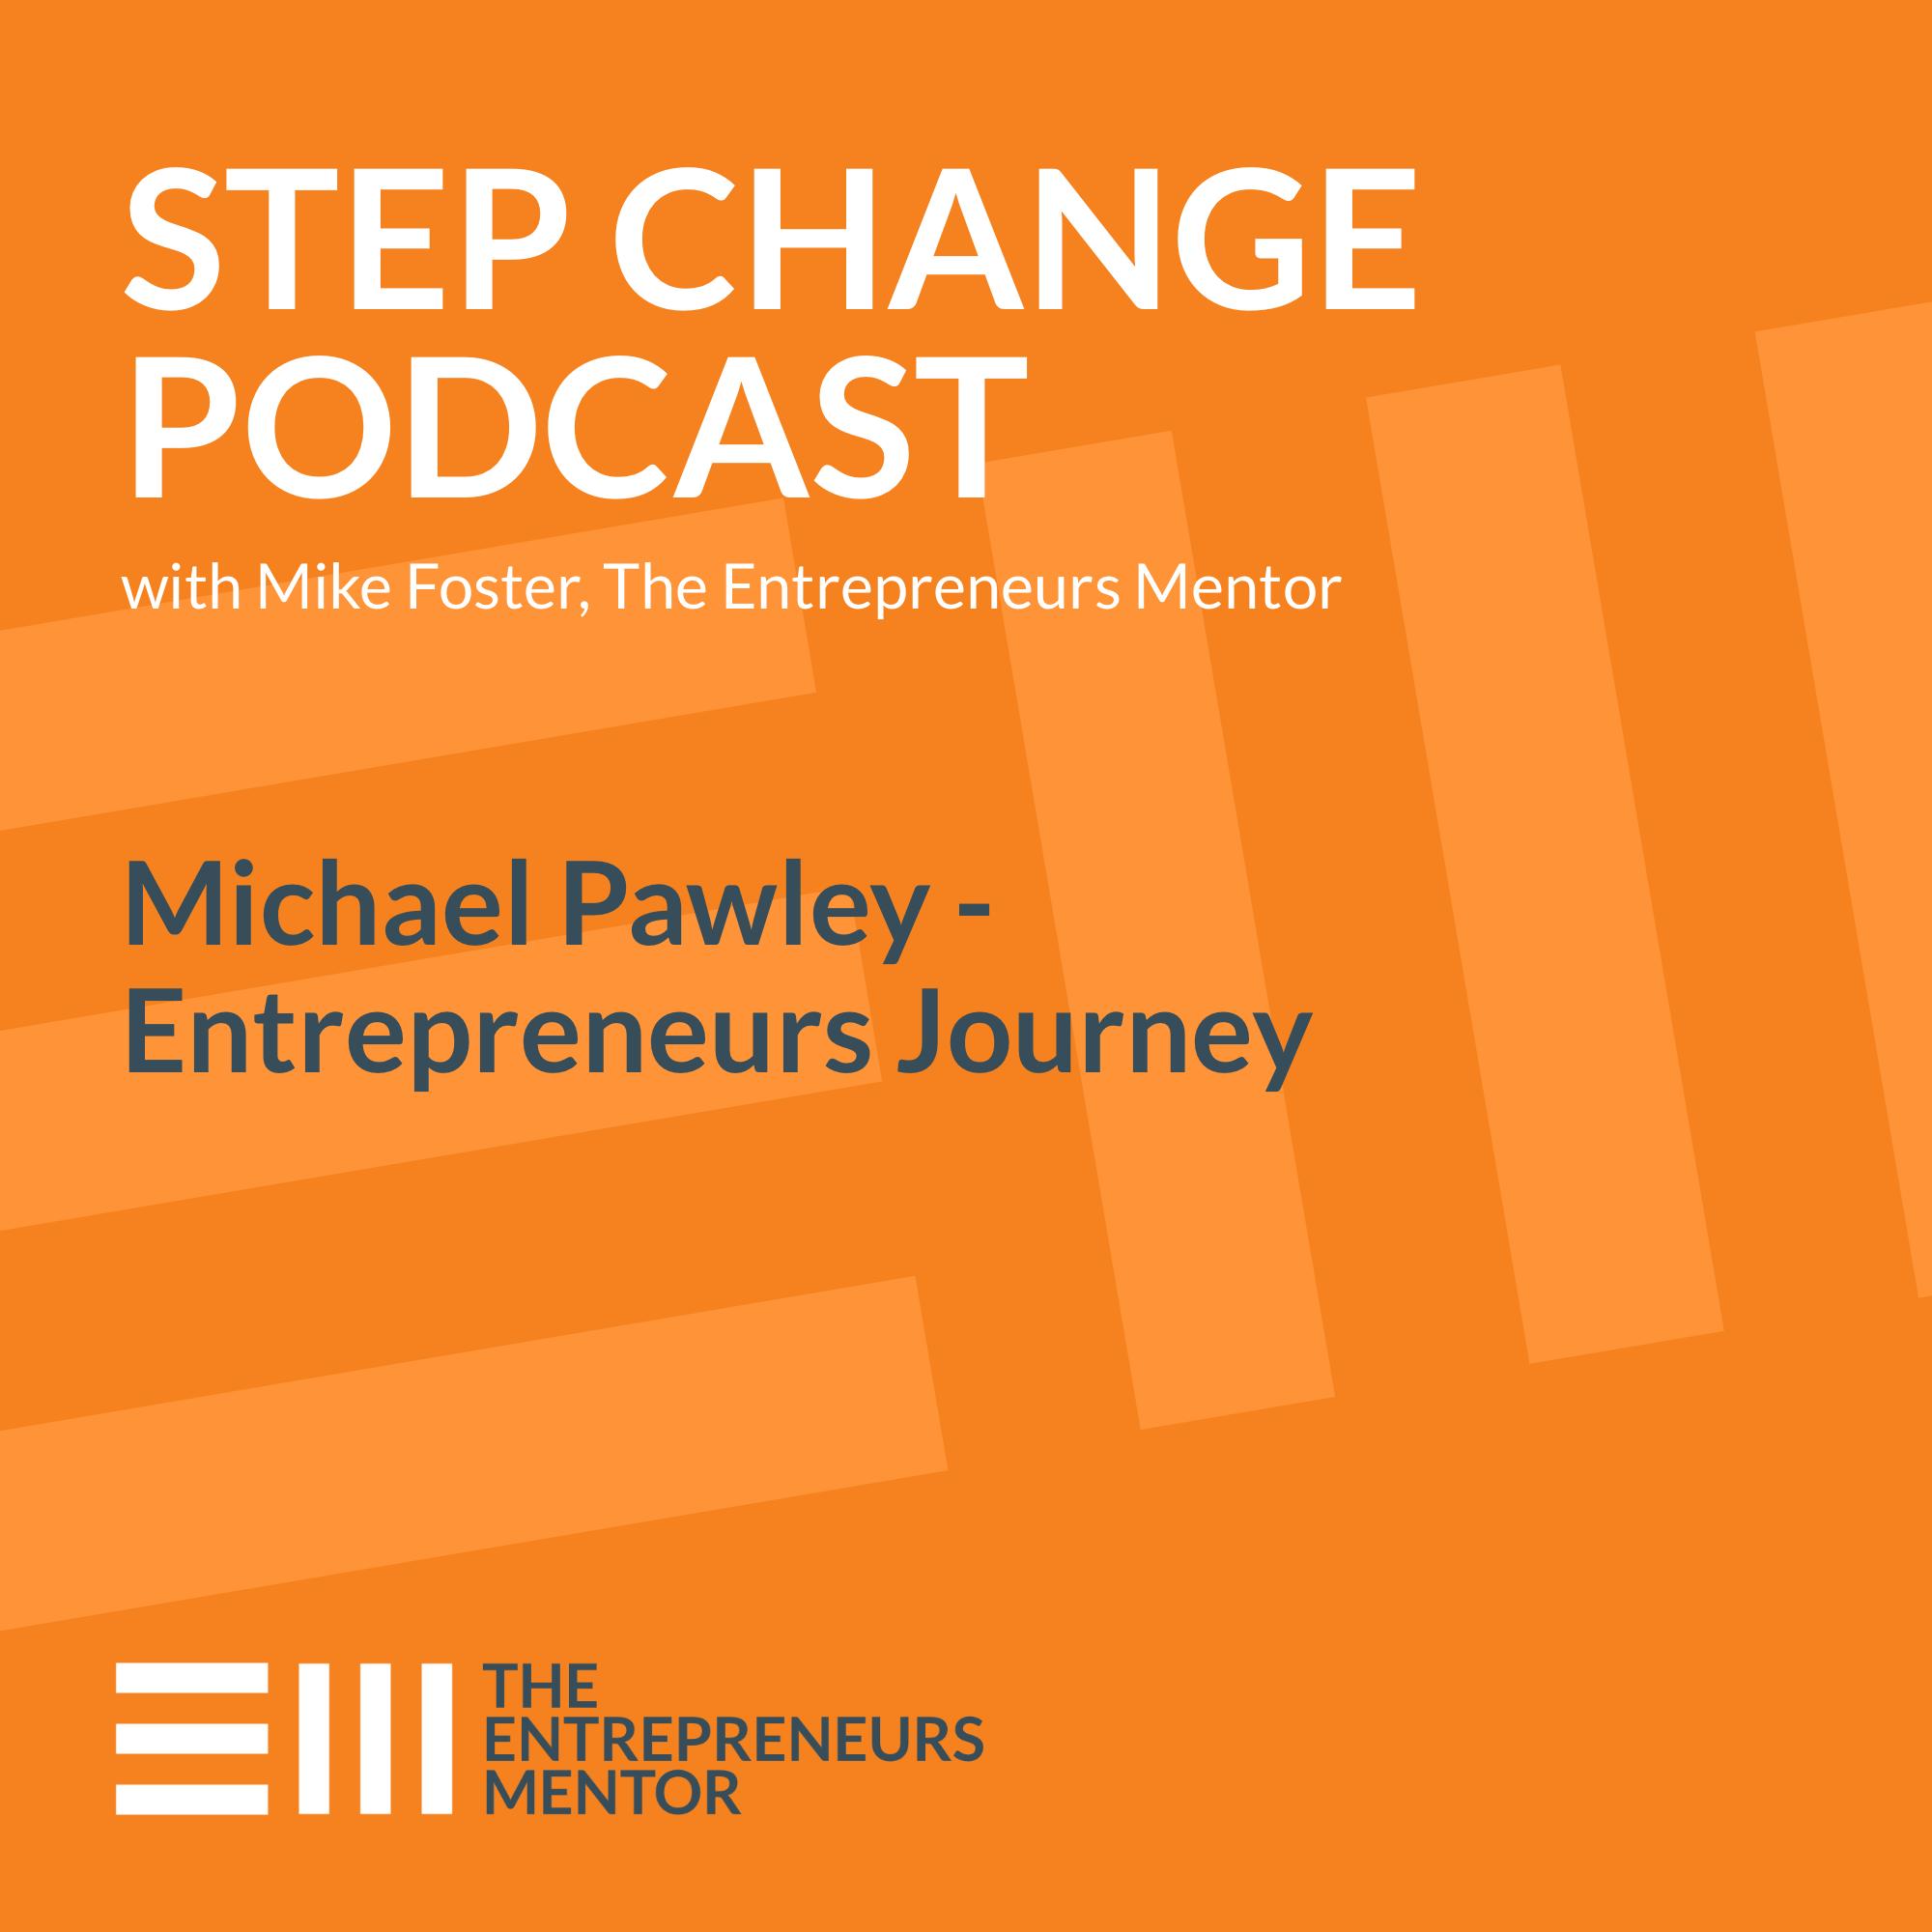 Step Change Podcast